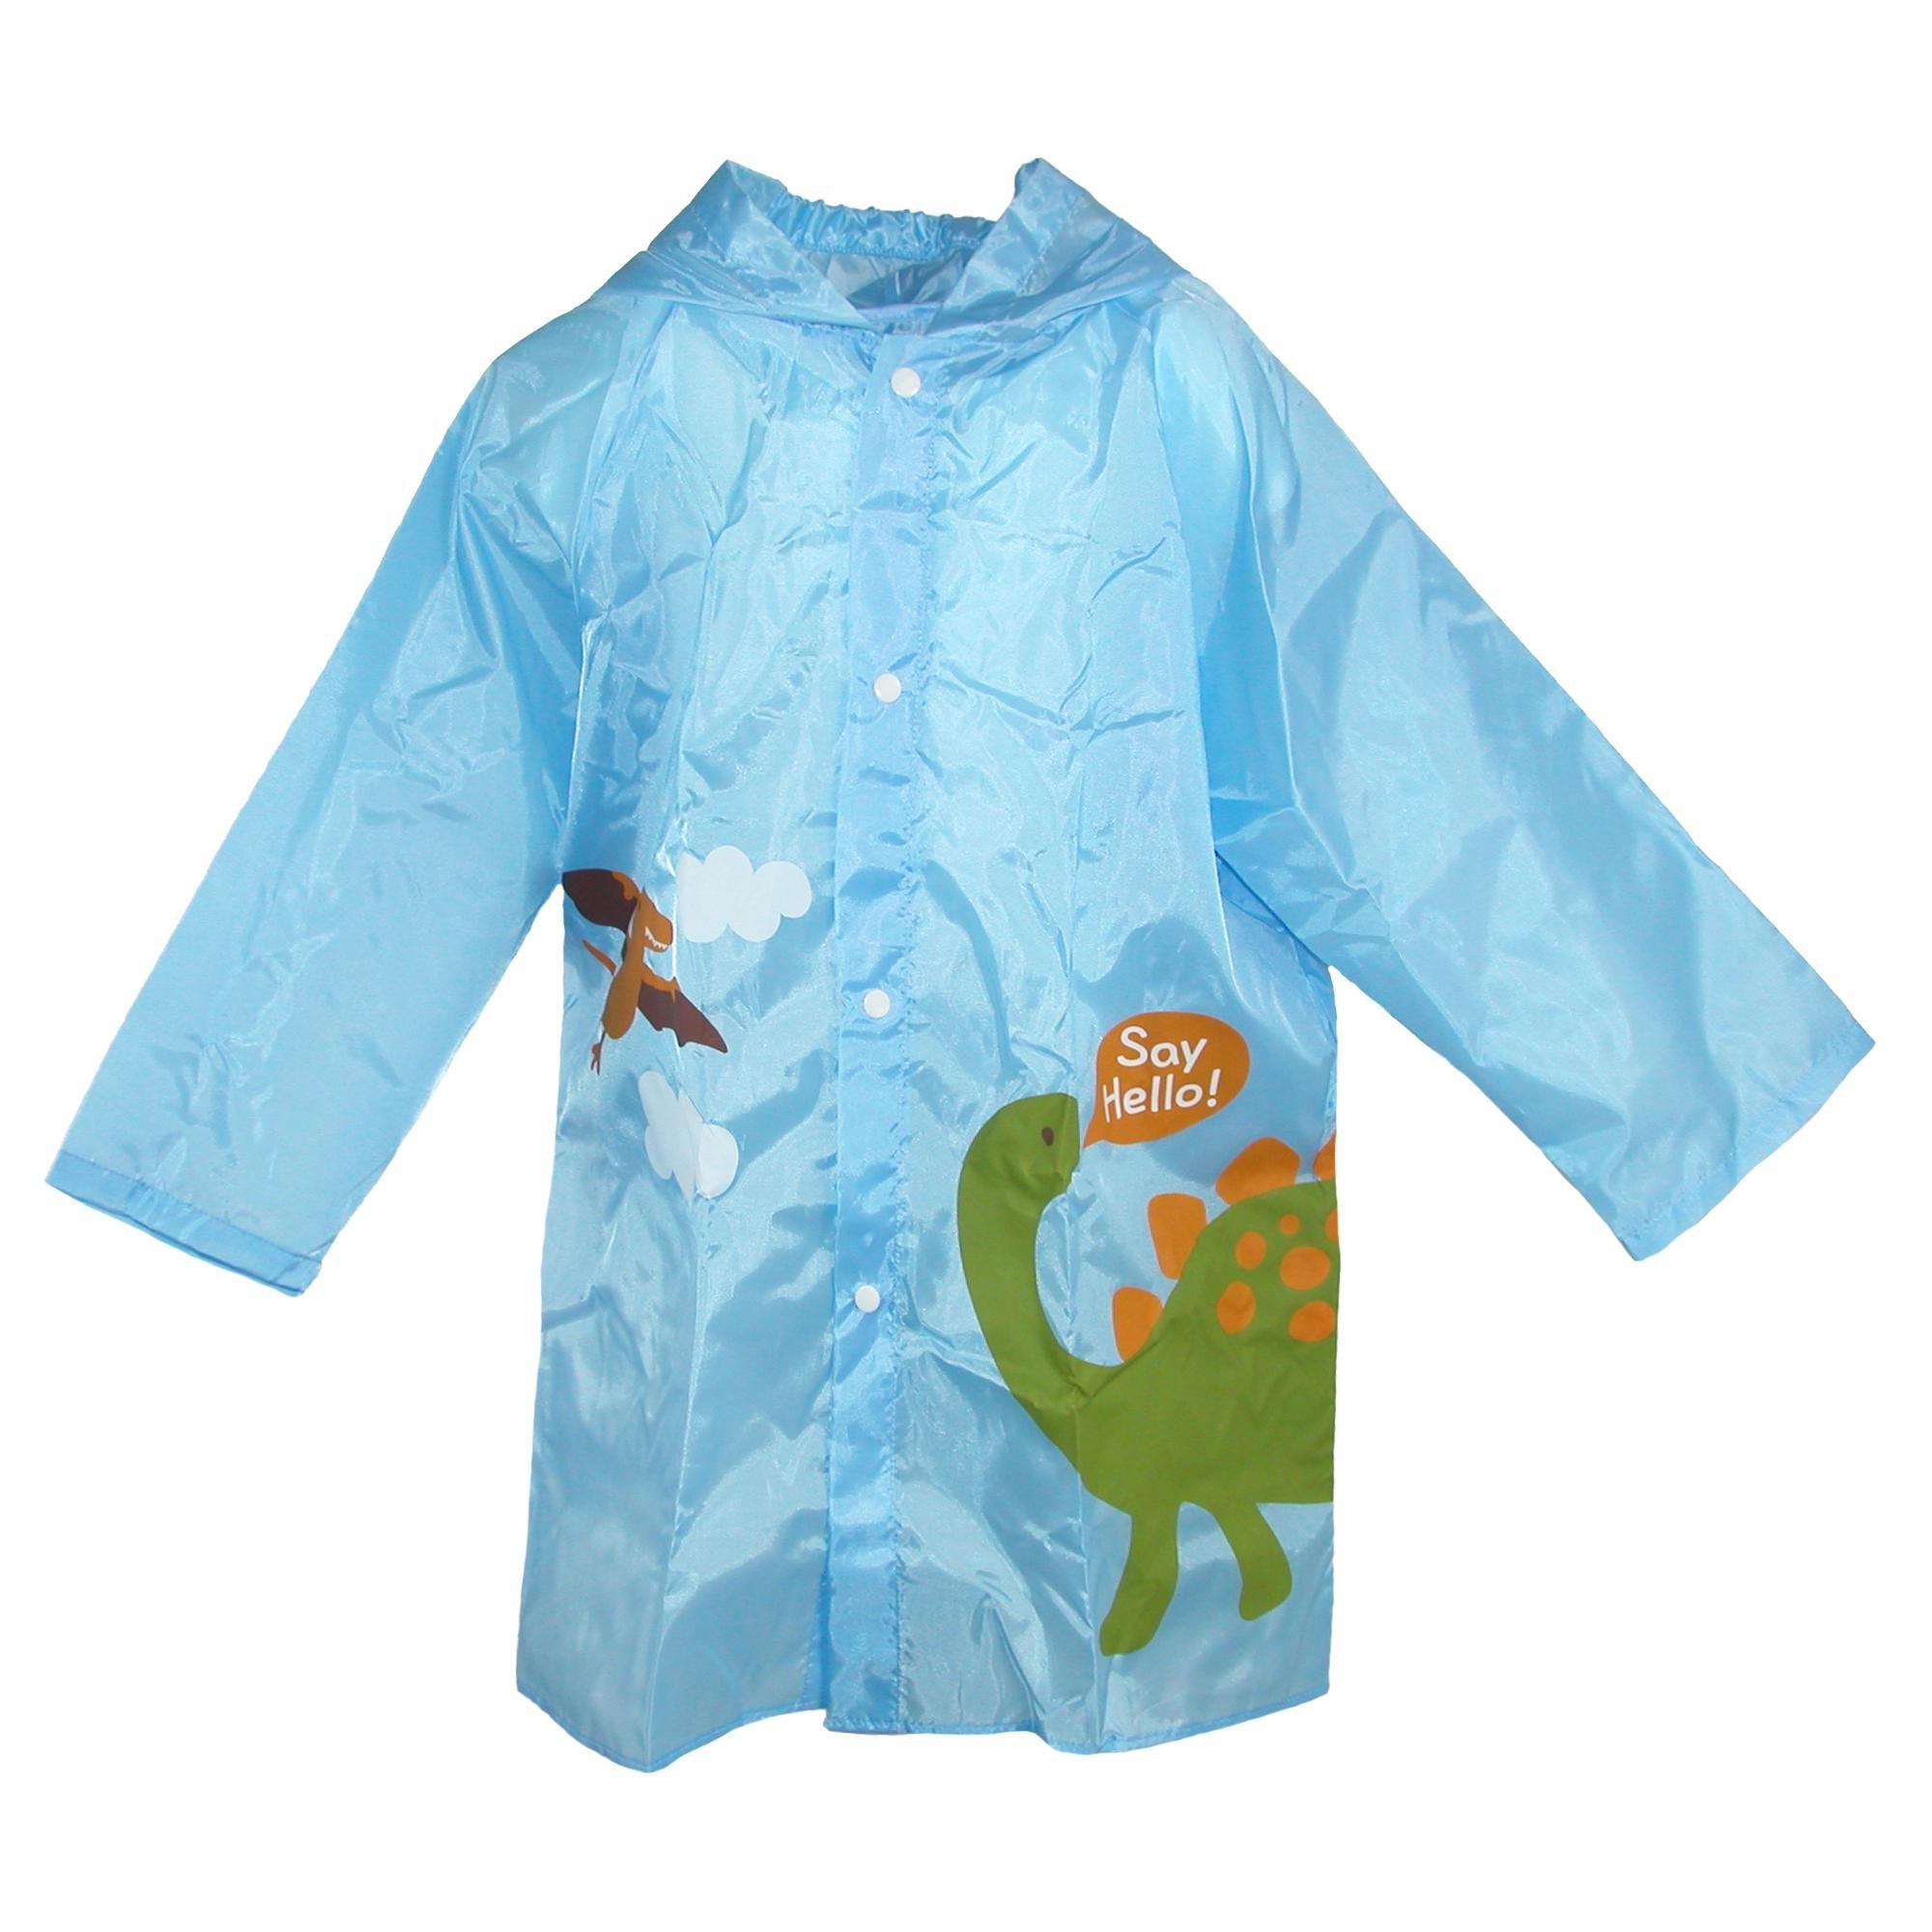 CTM Kid's Dinosaur Print Raincoat in Pouch, Blue